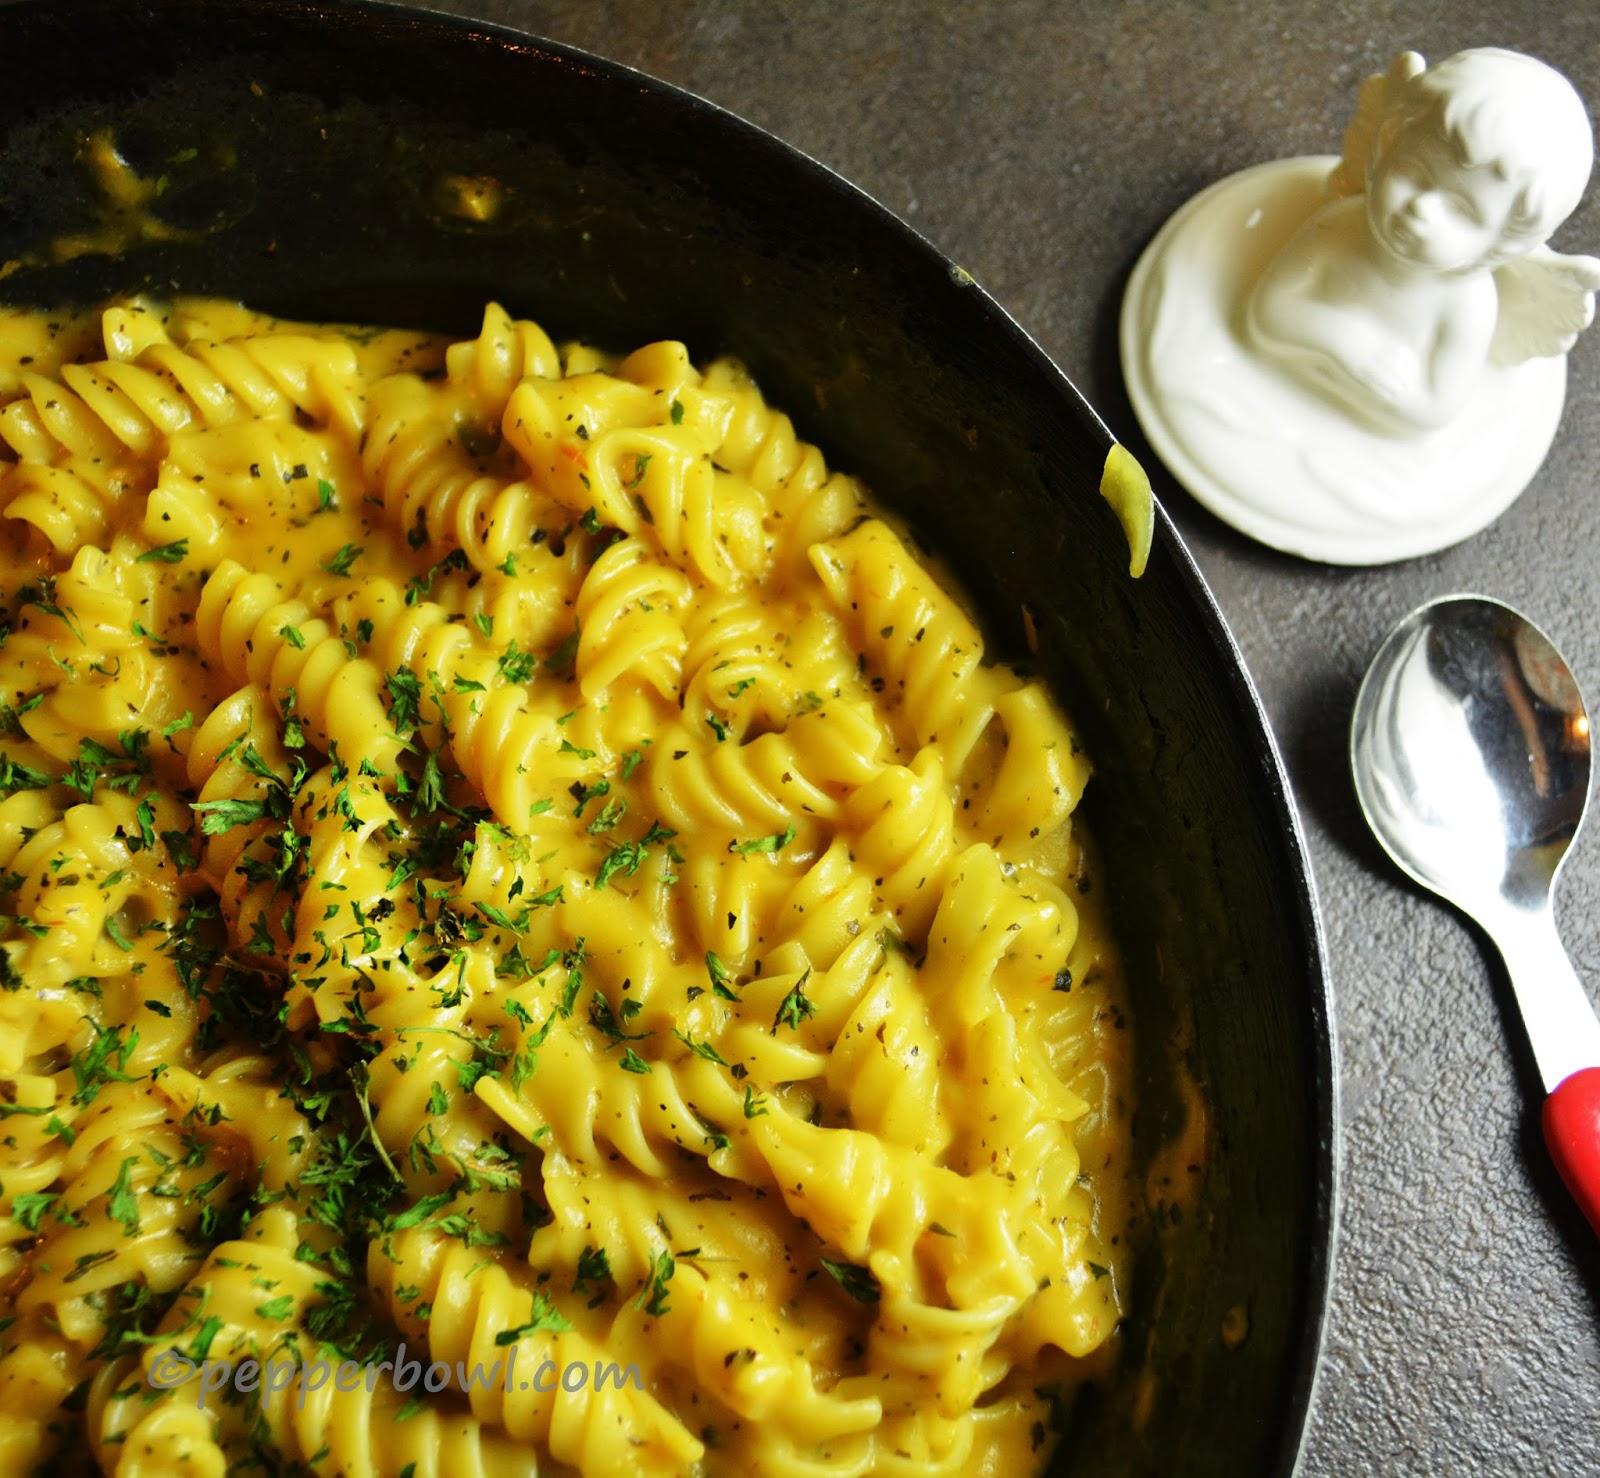 Rich Creamy Buttermilk Rotini Pasta, an easy dinner recipe